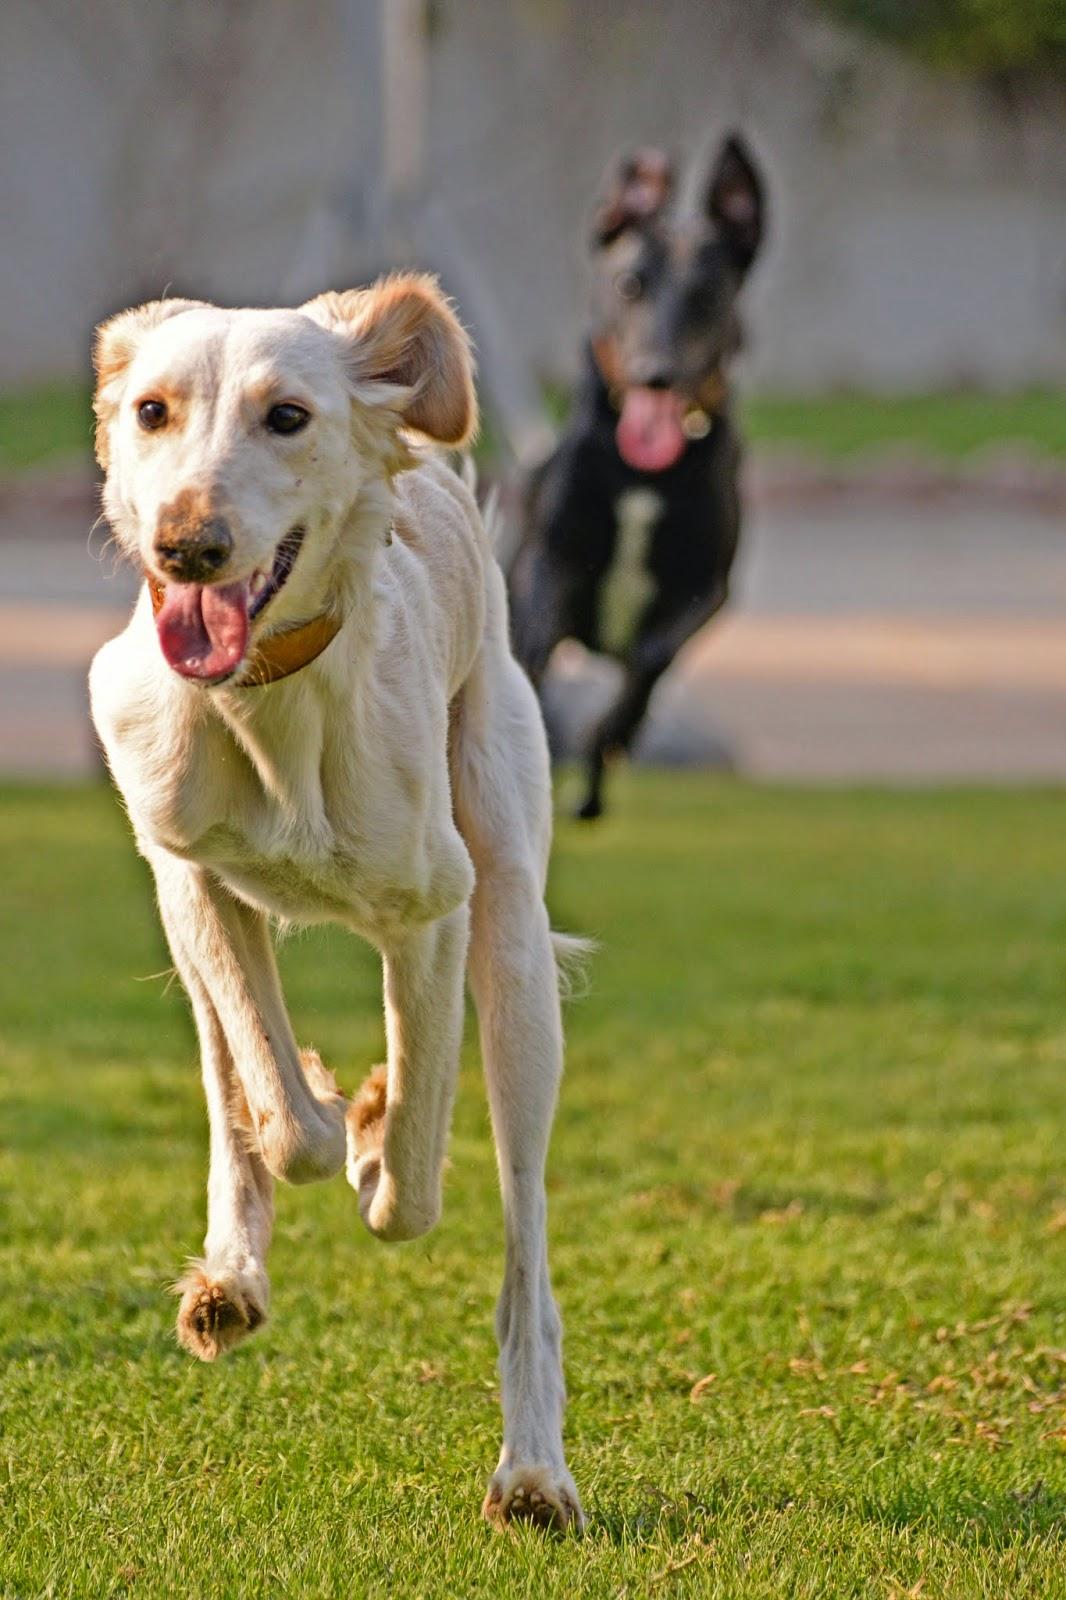 Lily and Bella run